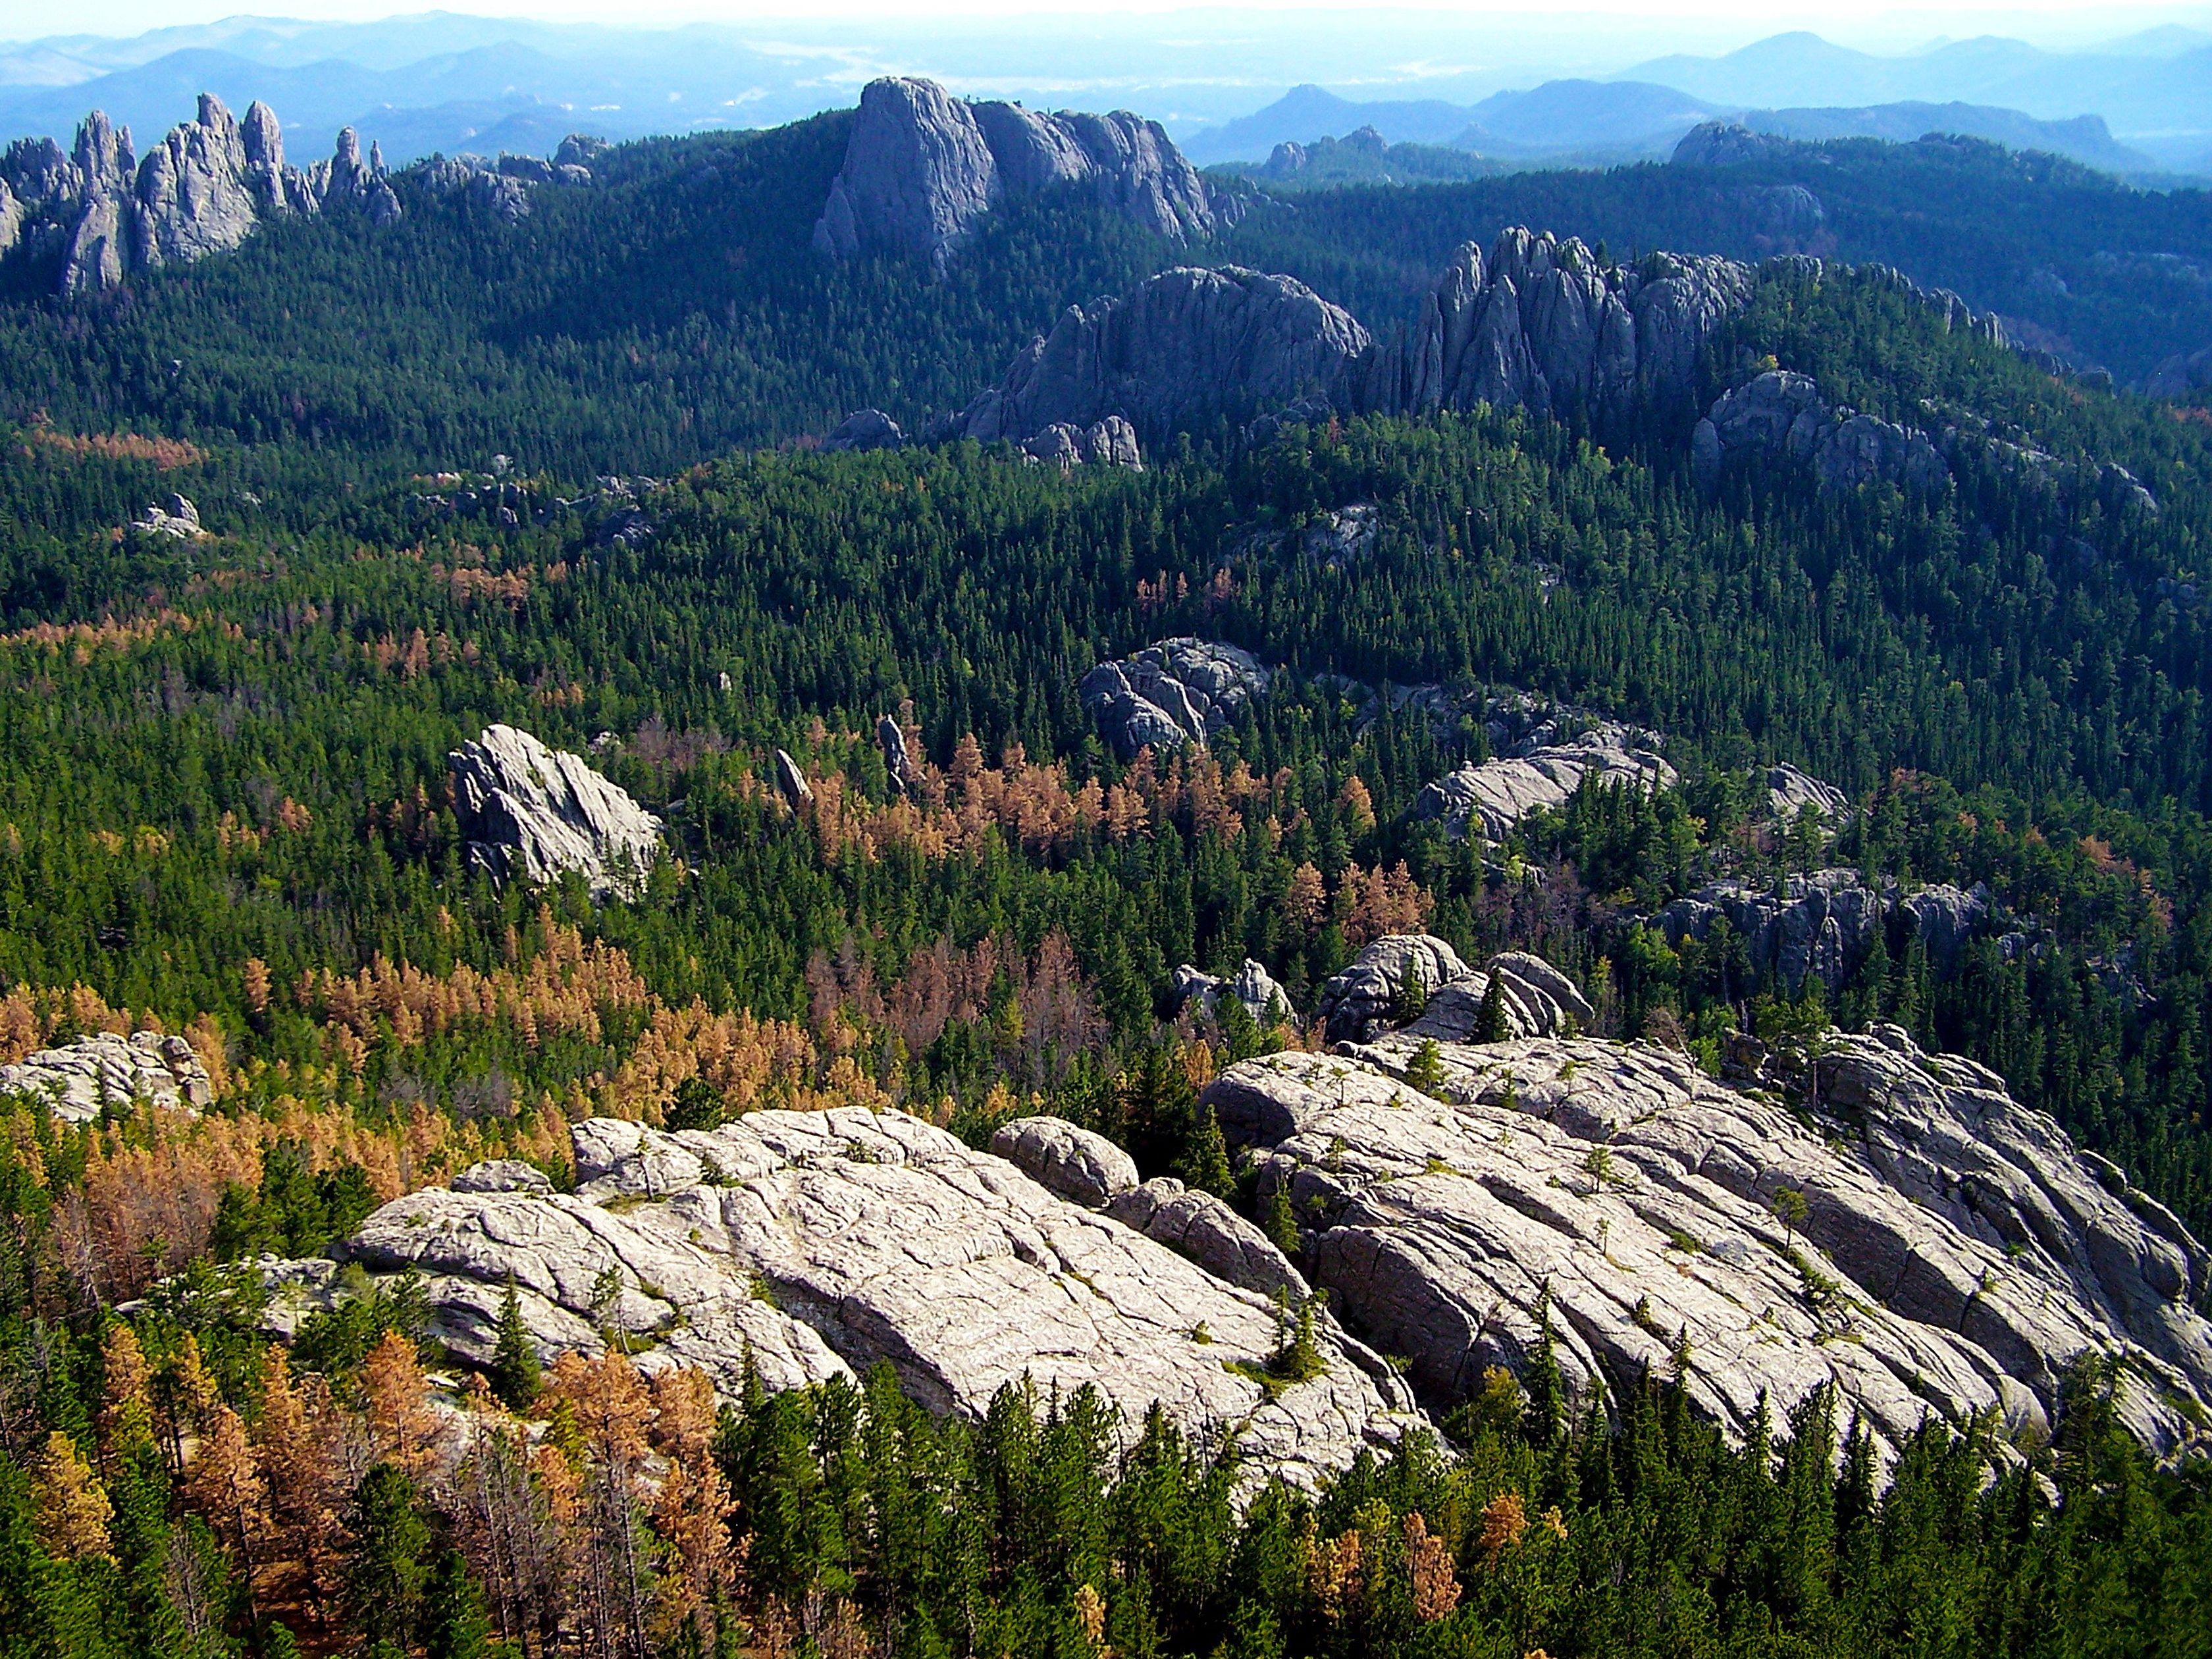 Black Hills national forest - Harney Peak | Travel | South Dakota ...